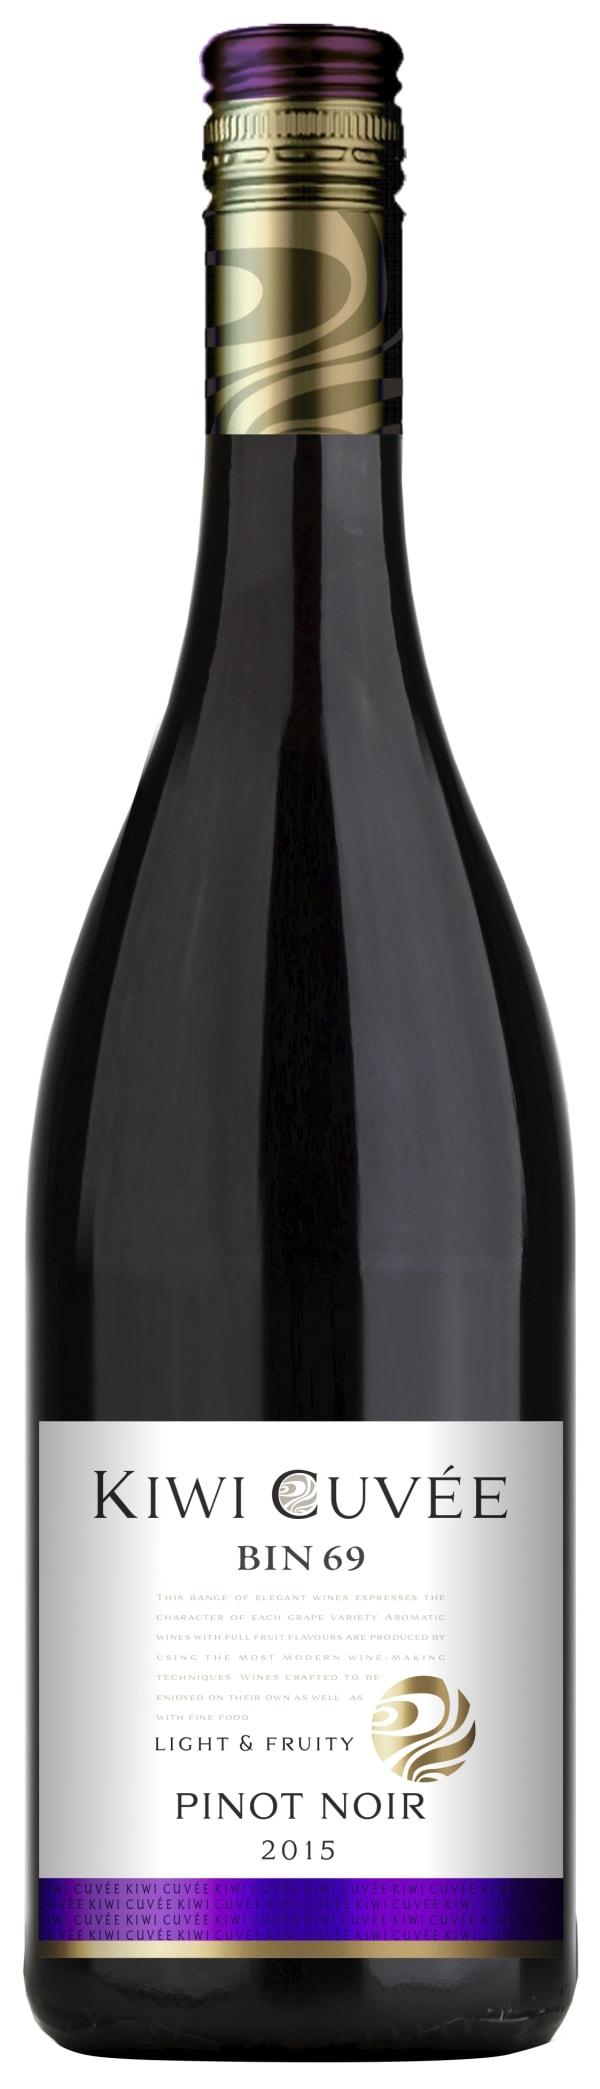 Kiwi Cuvée Bin 518 Pinot Noir 2015